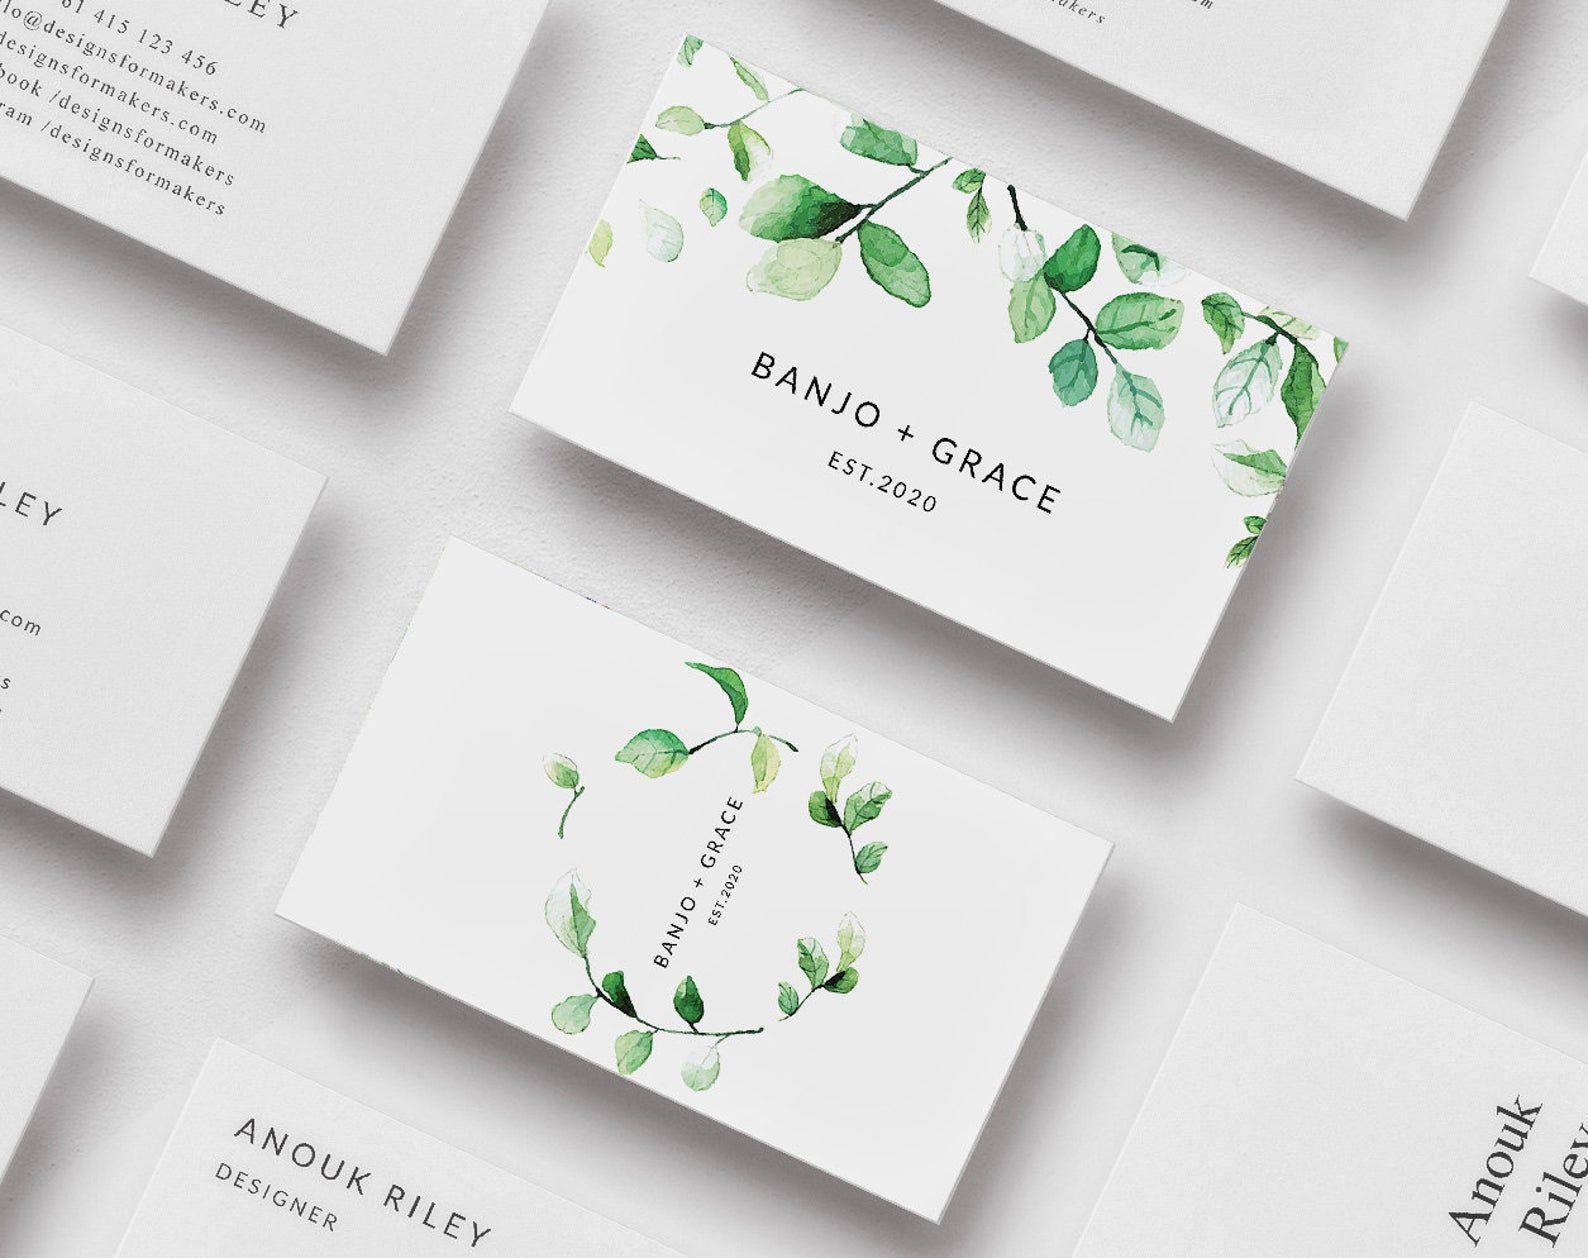 Business Cards Business Card Design Business Card Template Etsy Business Card Design Make Business Cards Business Card Pattern